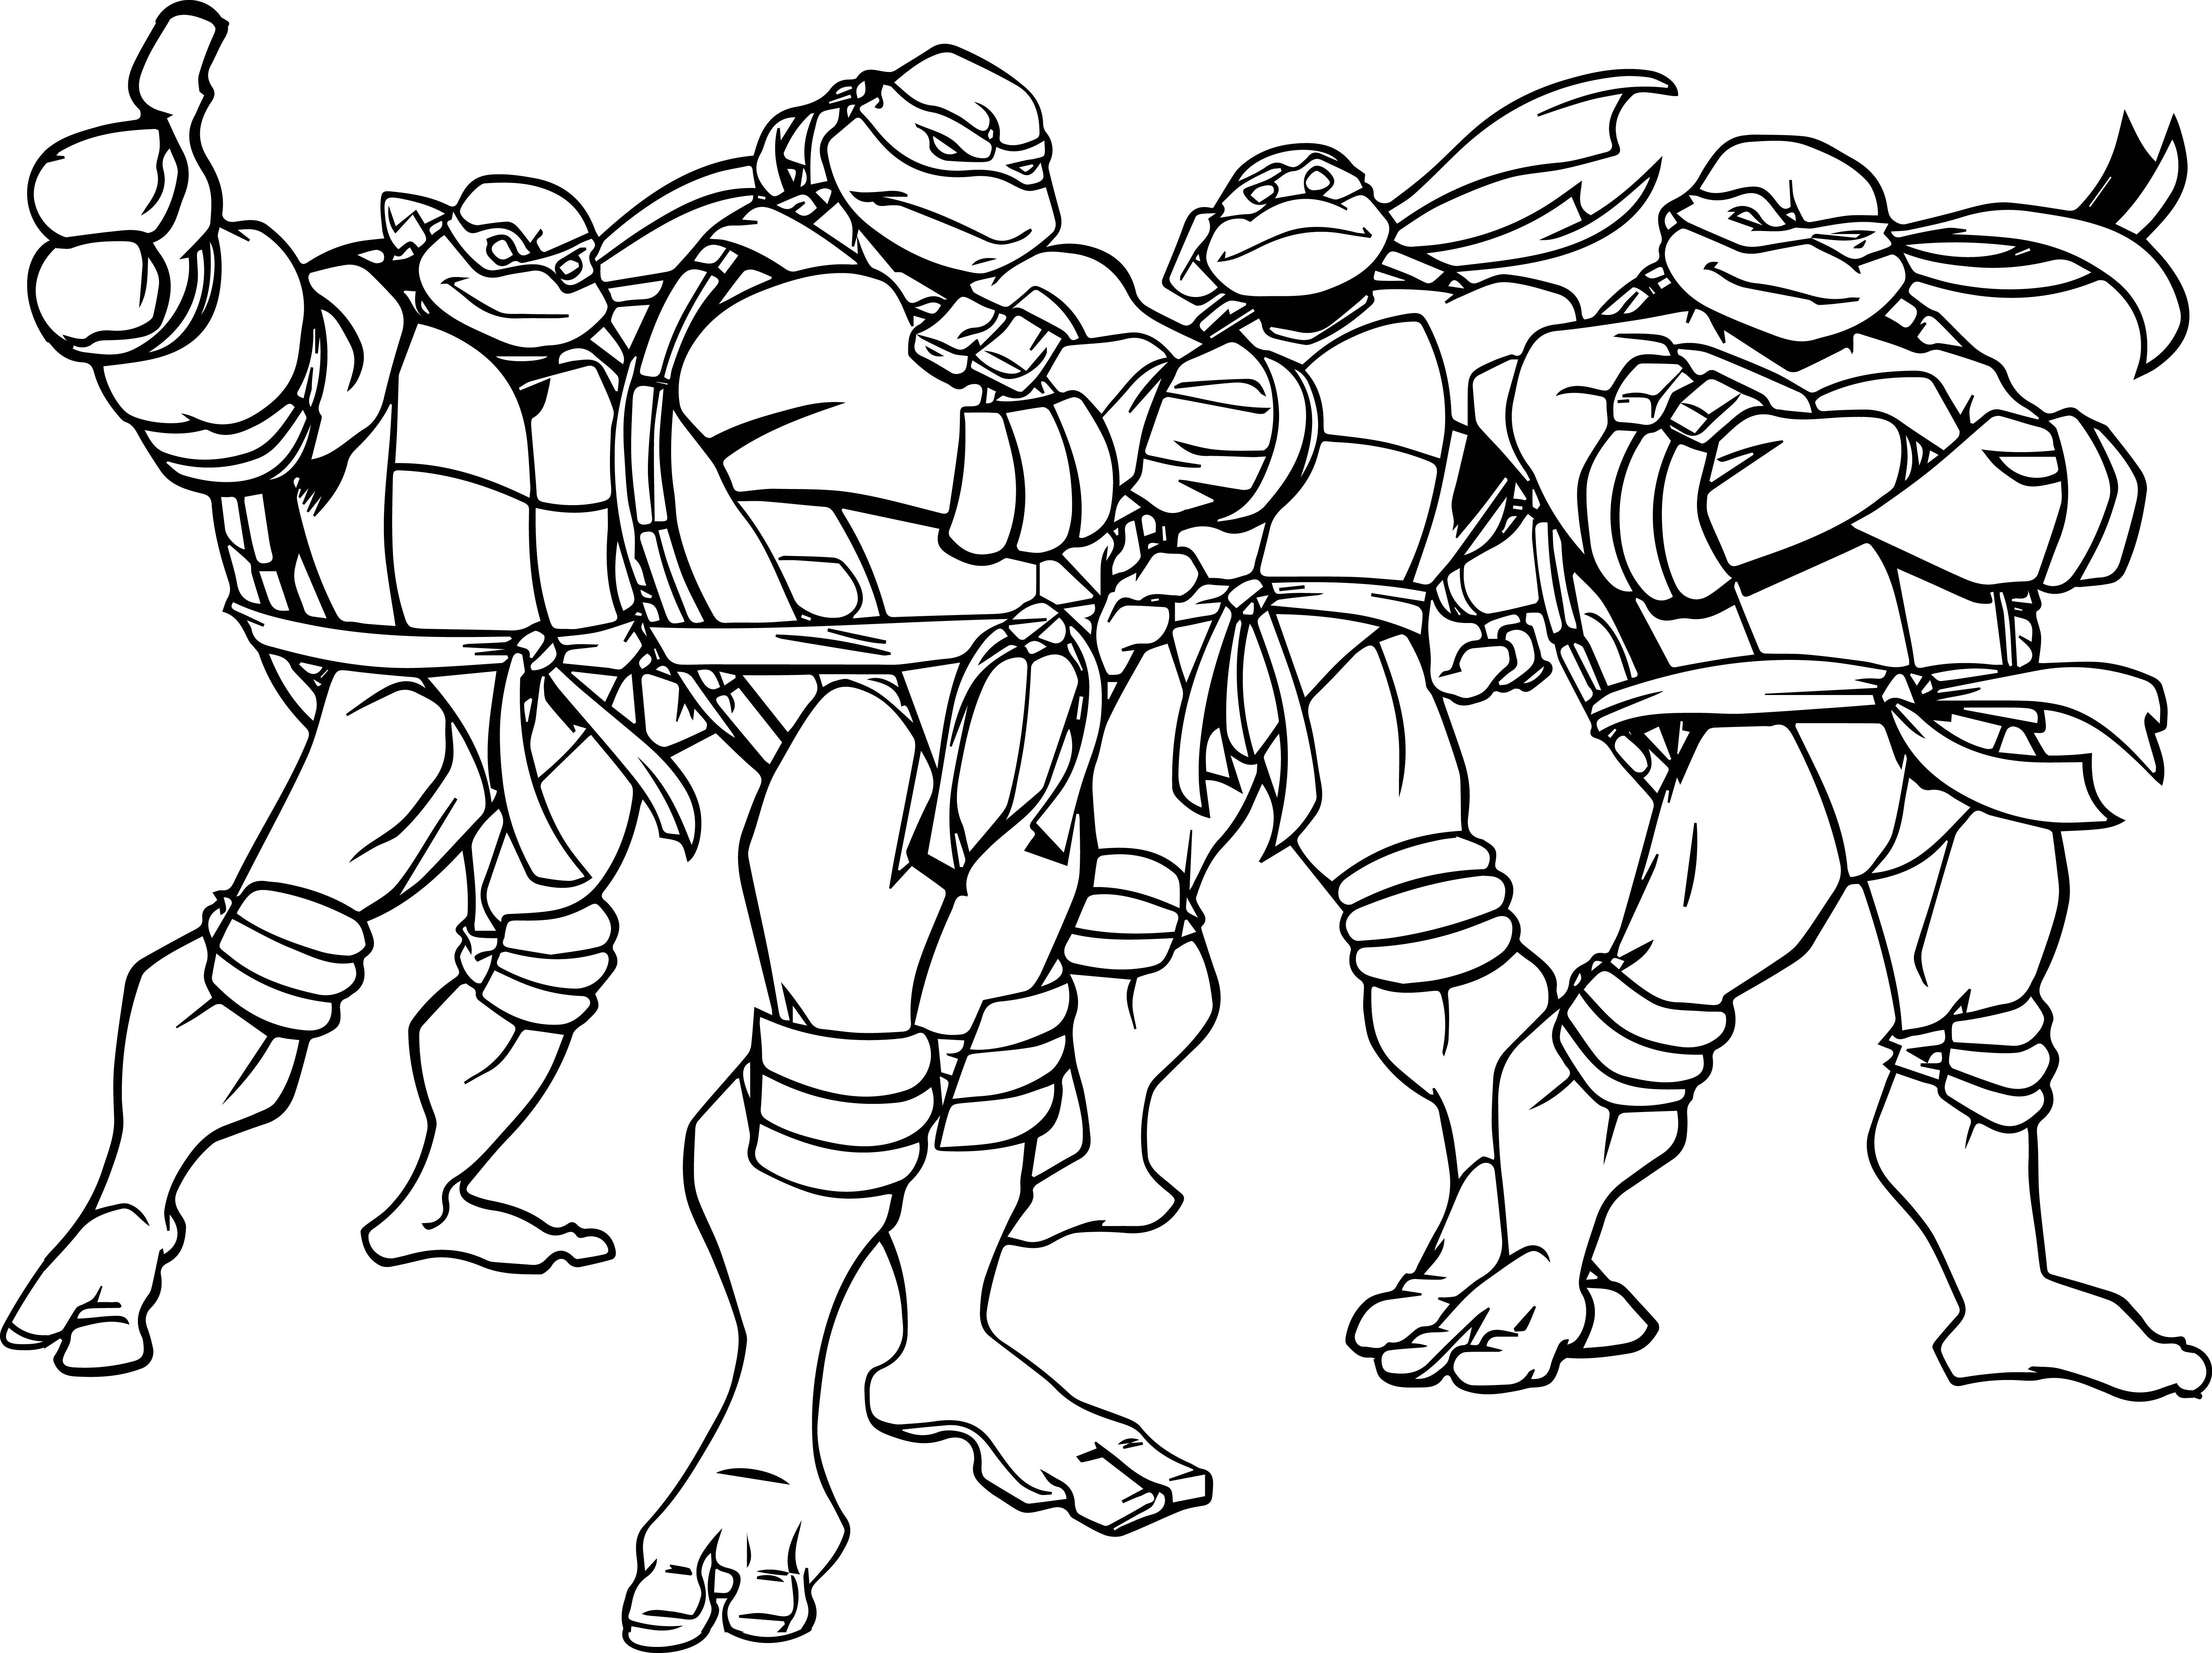 6176x4614 Perfect Teenage Mutant Ninja Turtles Coloring Pages To Print